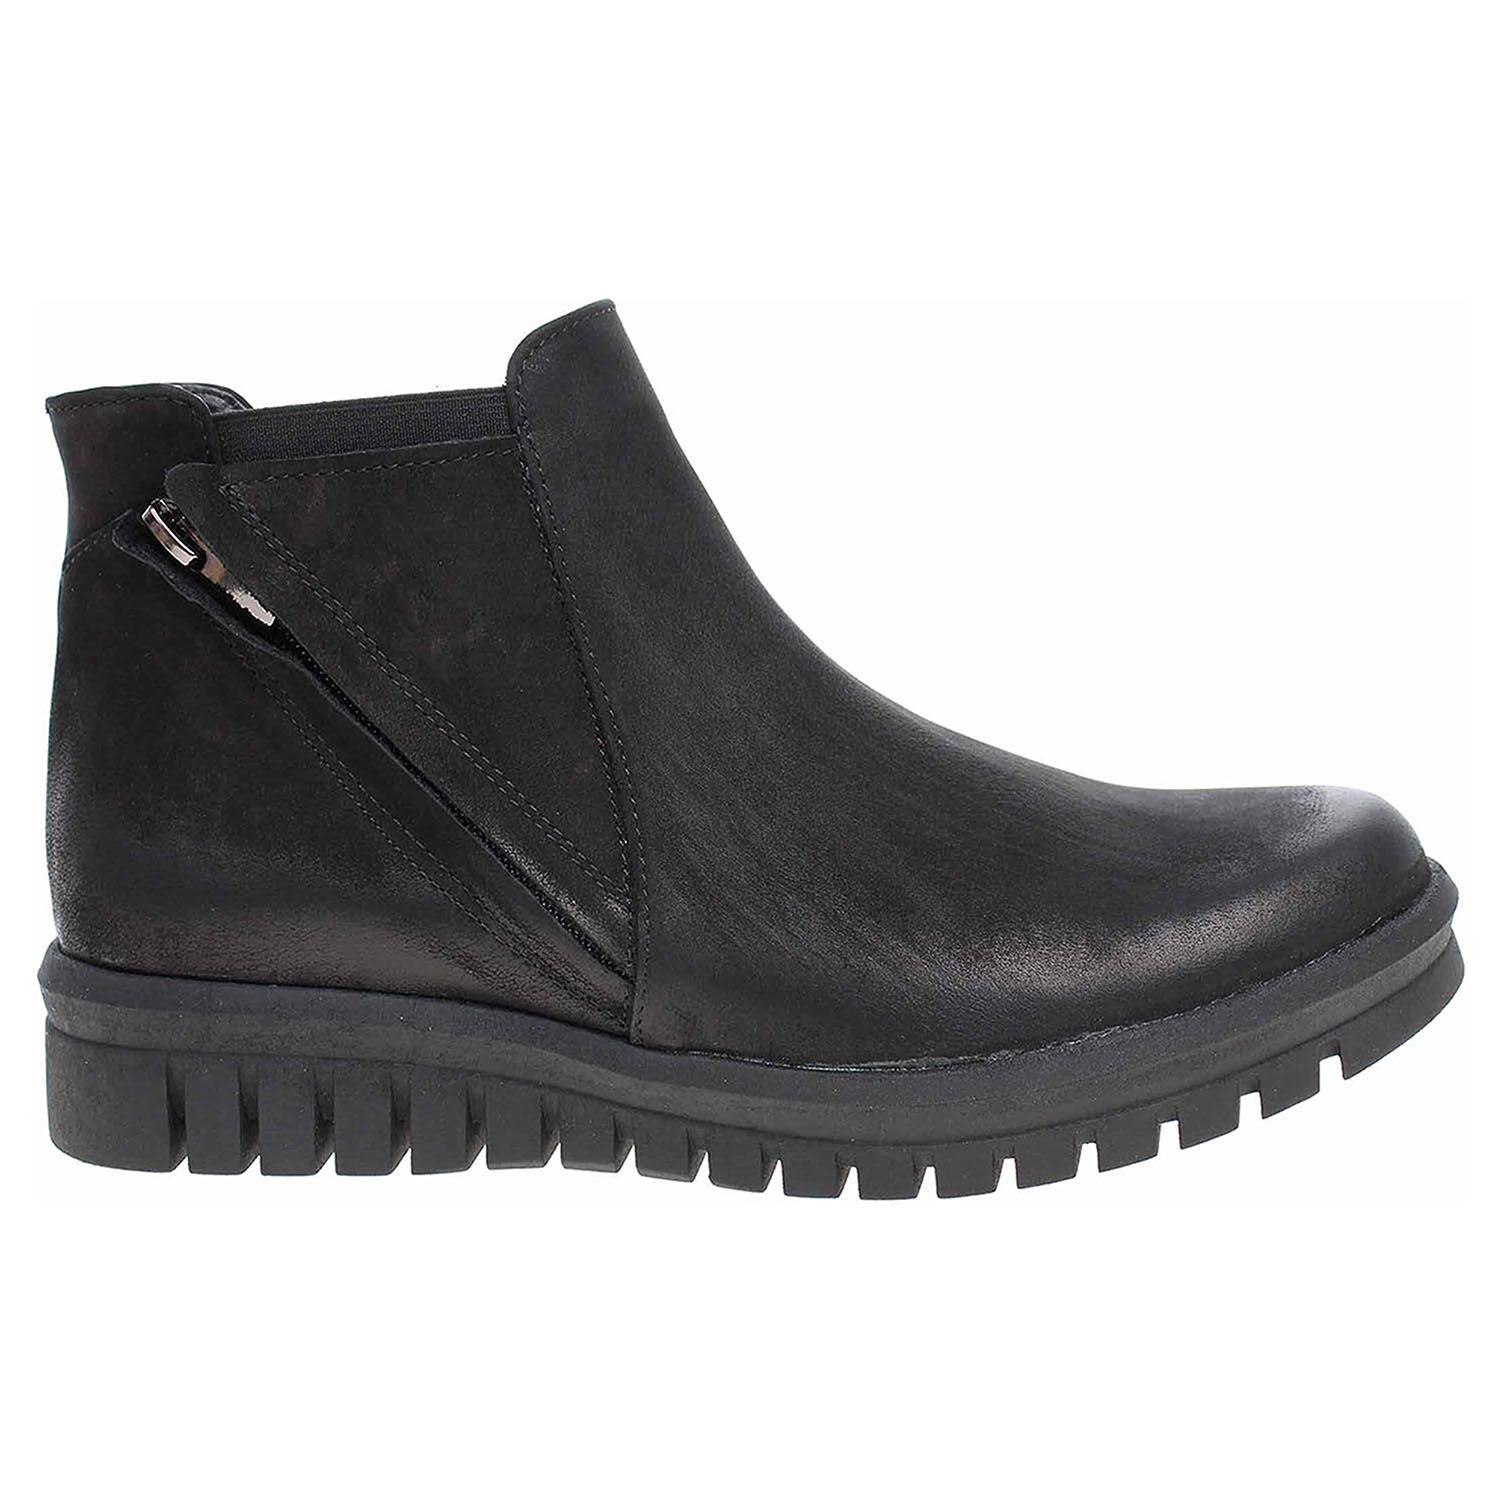 Ecco Dámská obuv J3880 černá nubuk 22600976 f1a8acafce9